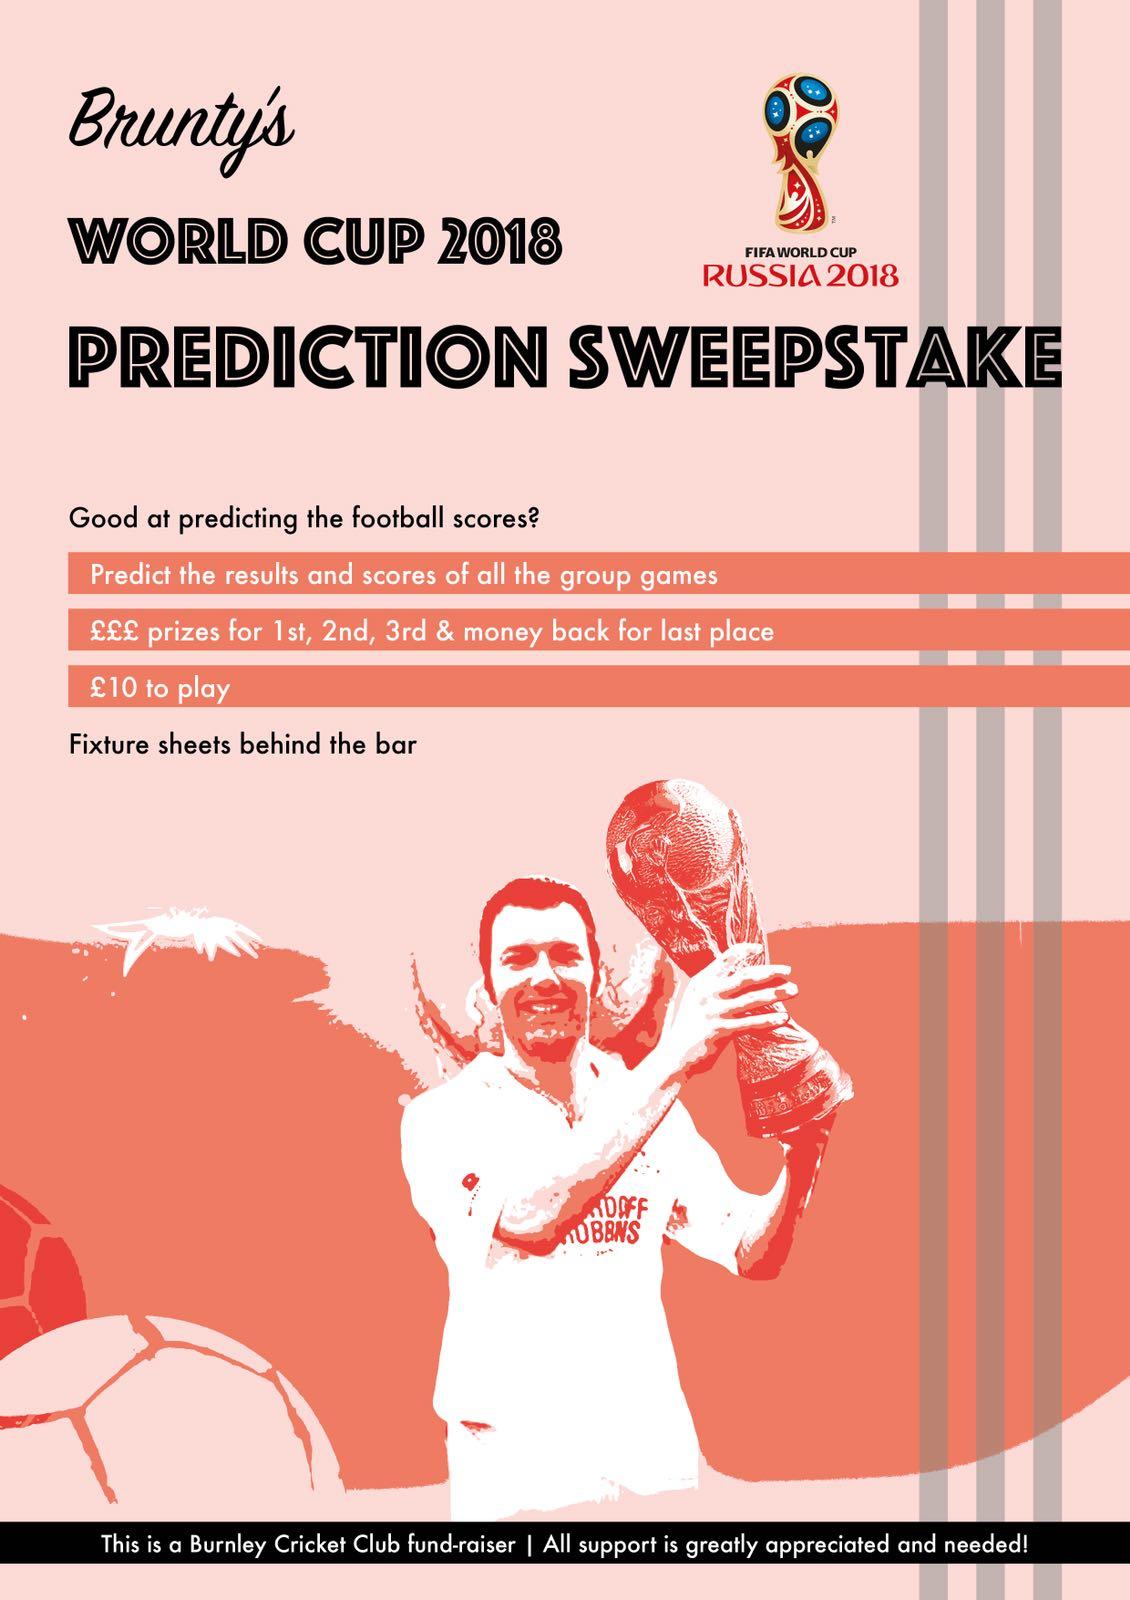 burnley cricket club world cup prediction sweepstake